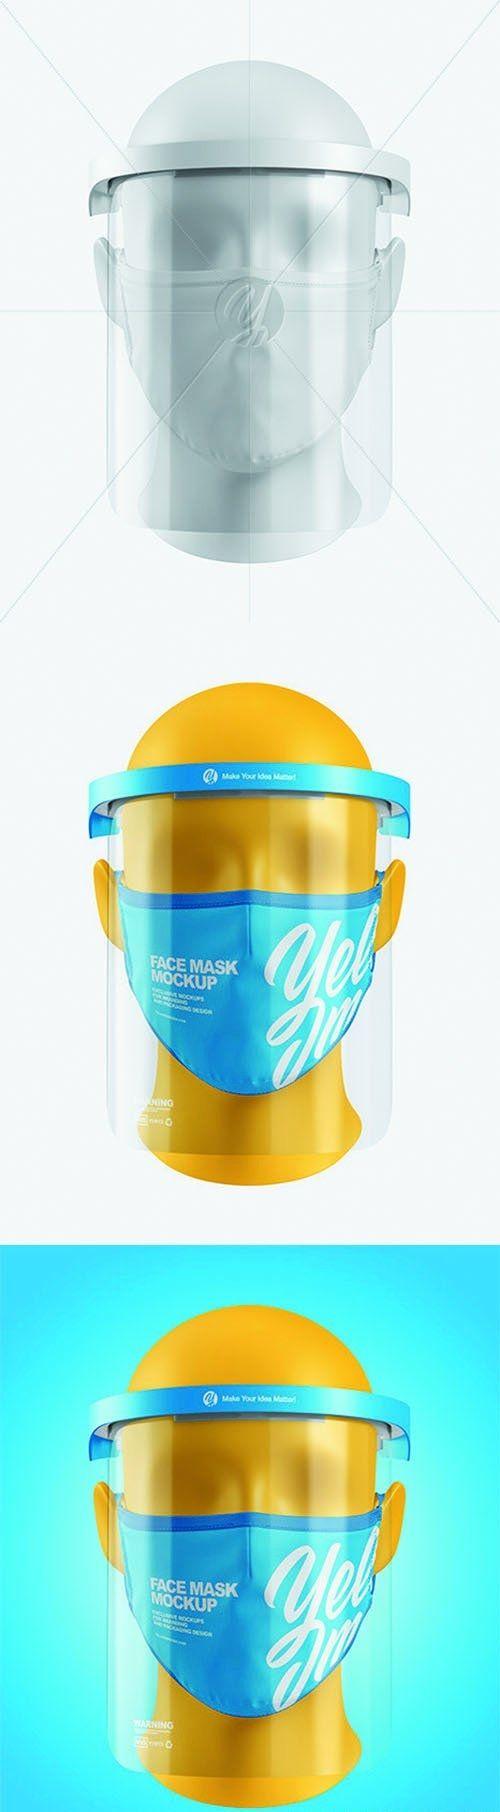 Download Face Mask Face Shield Mockup 63621 Desirefx Com Face Shield Face Mask Shield